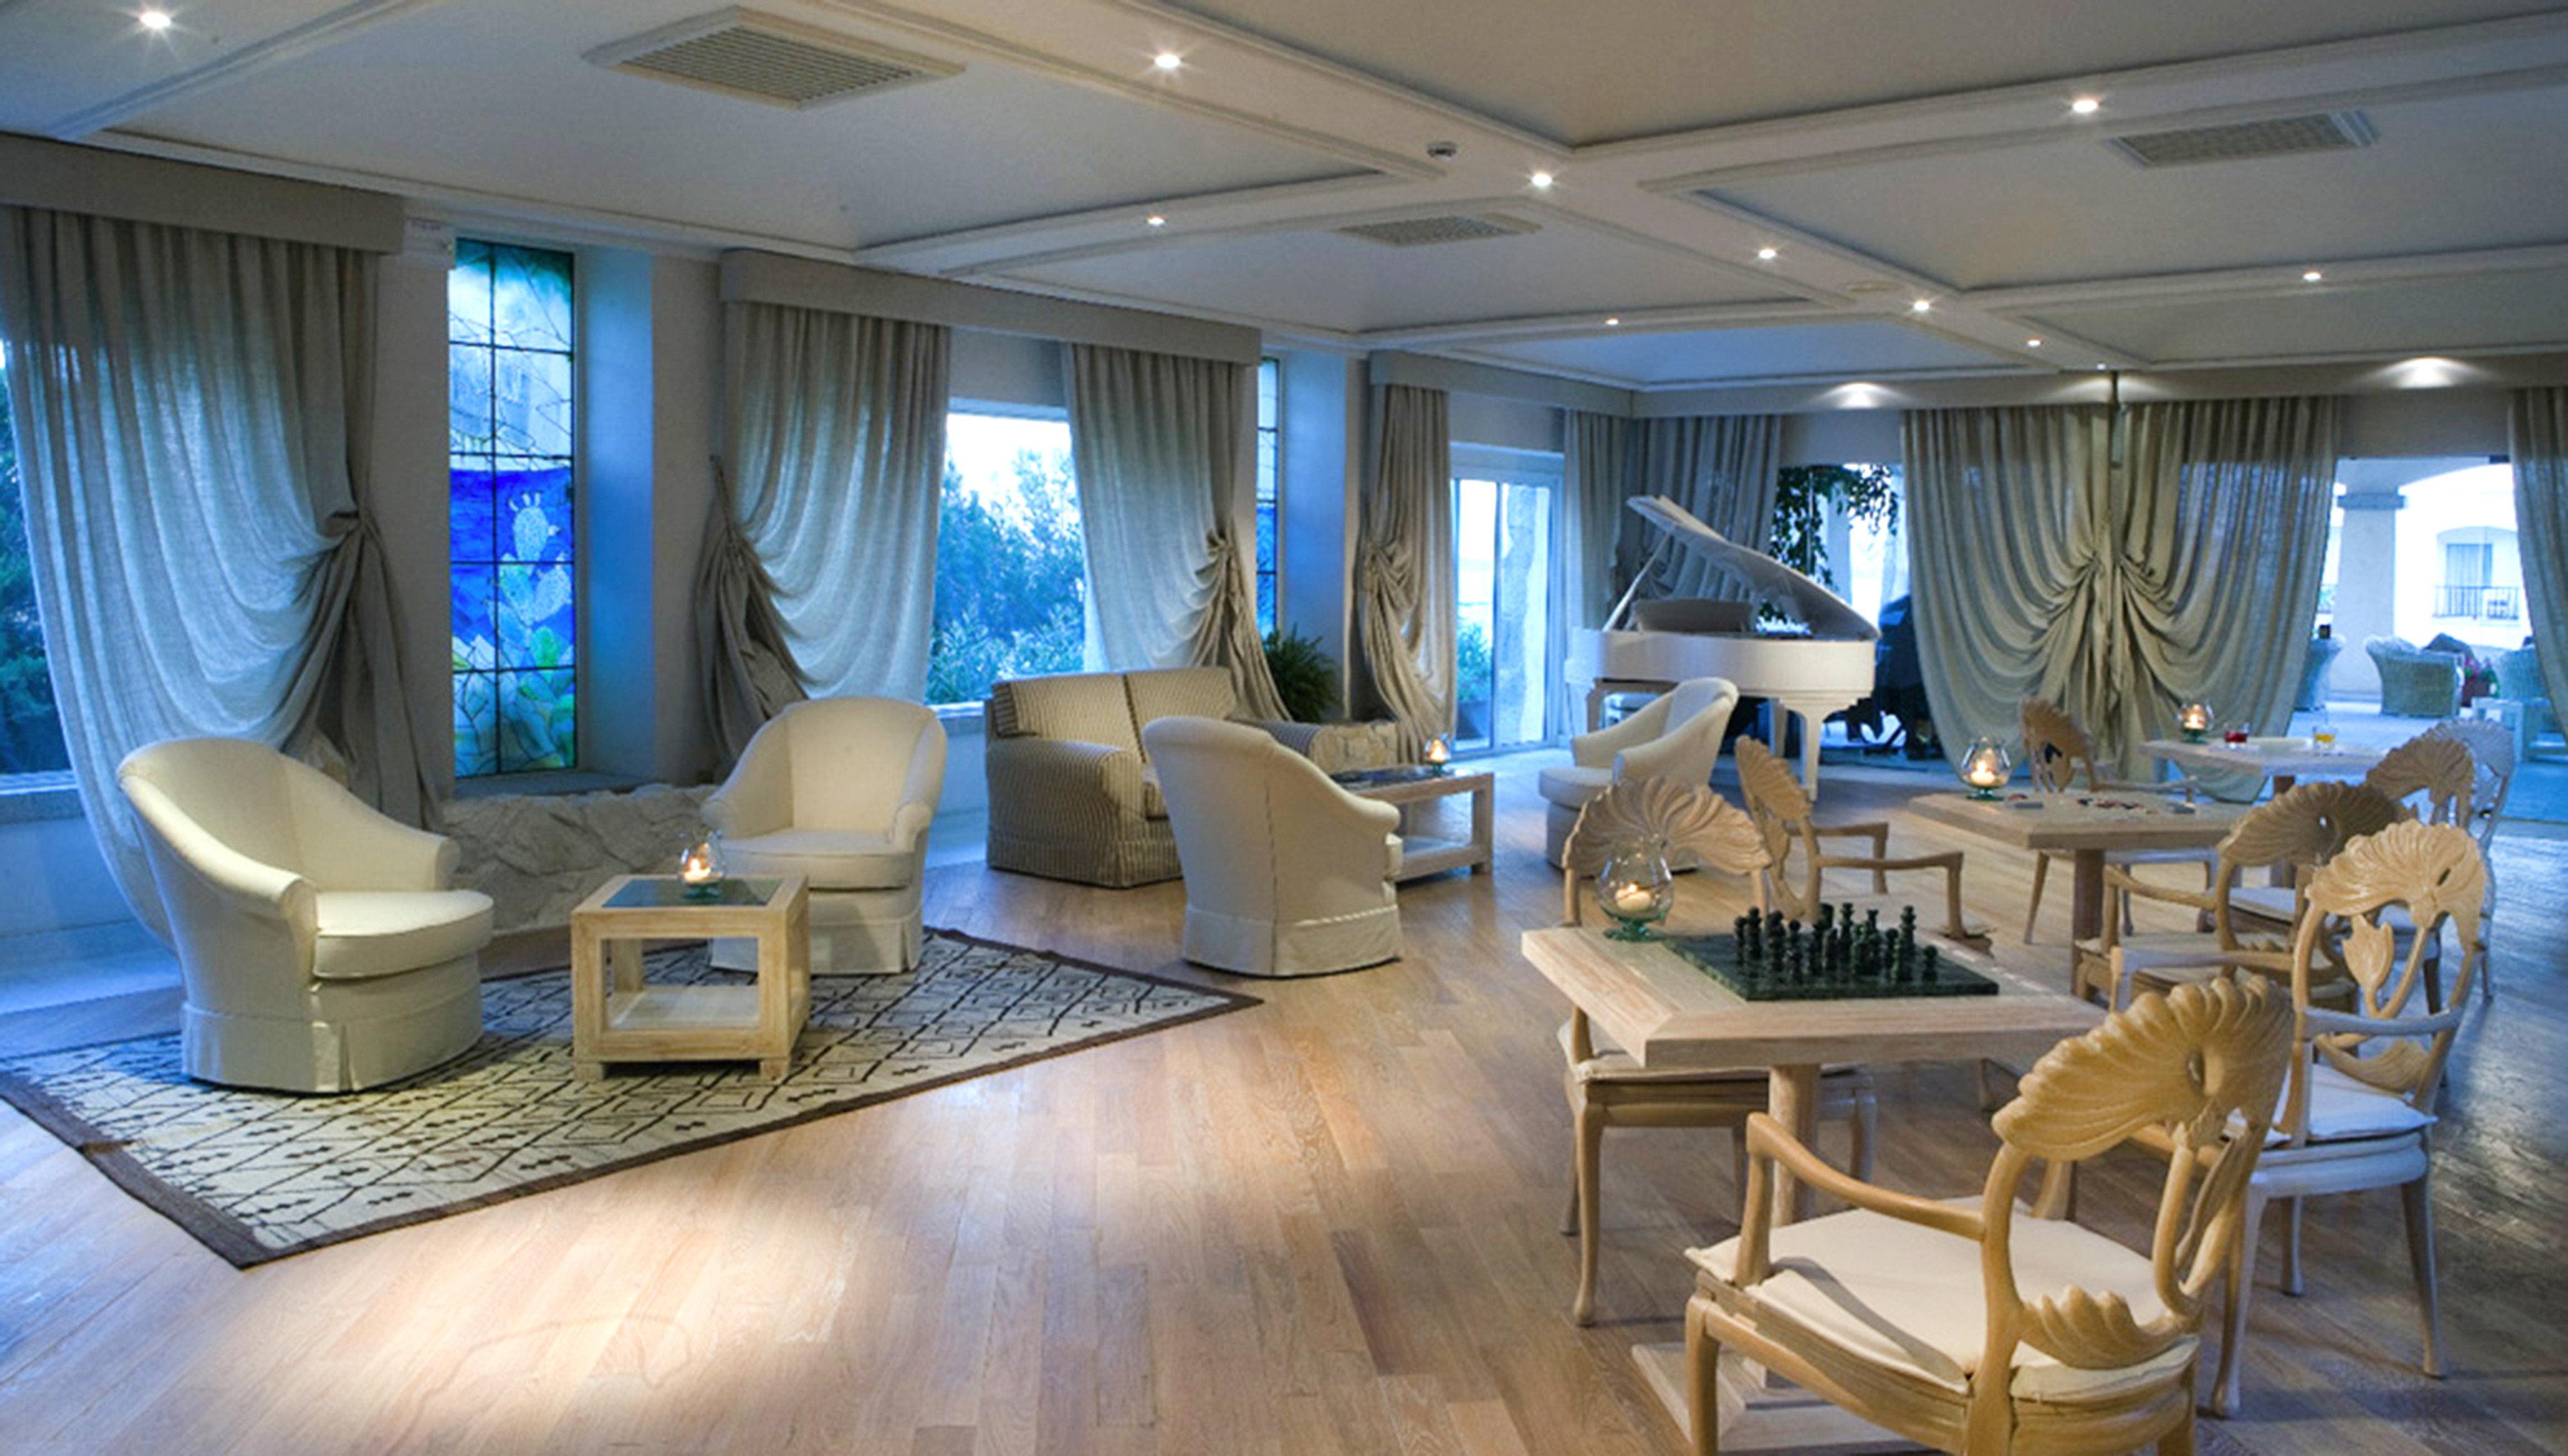 Elegant Lounge Luxury Romantic property Lobby living room condominium yacht conference hall